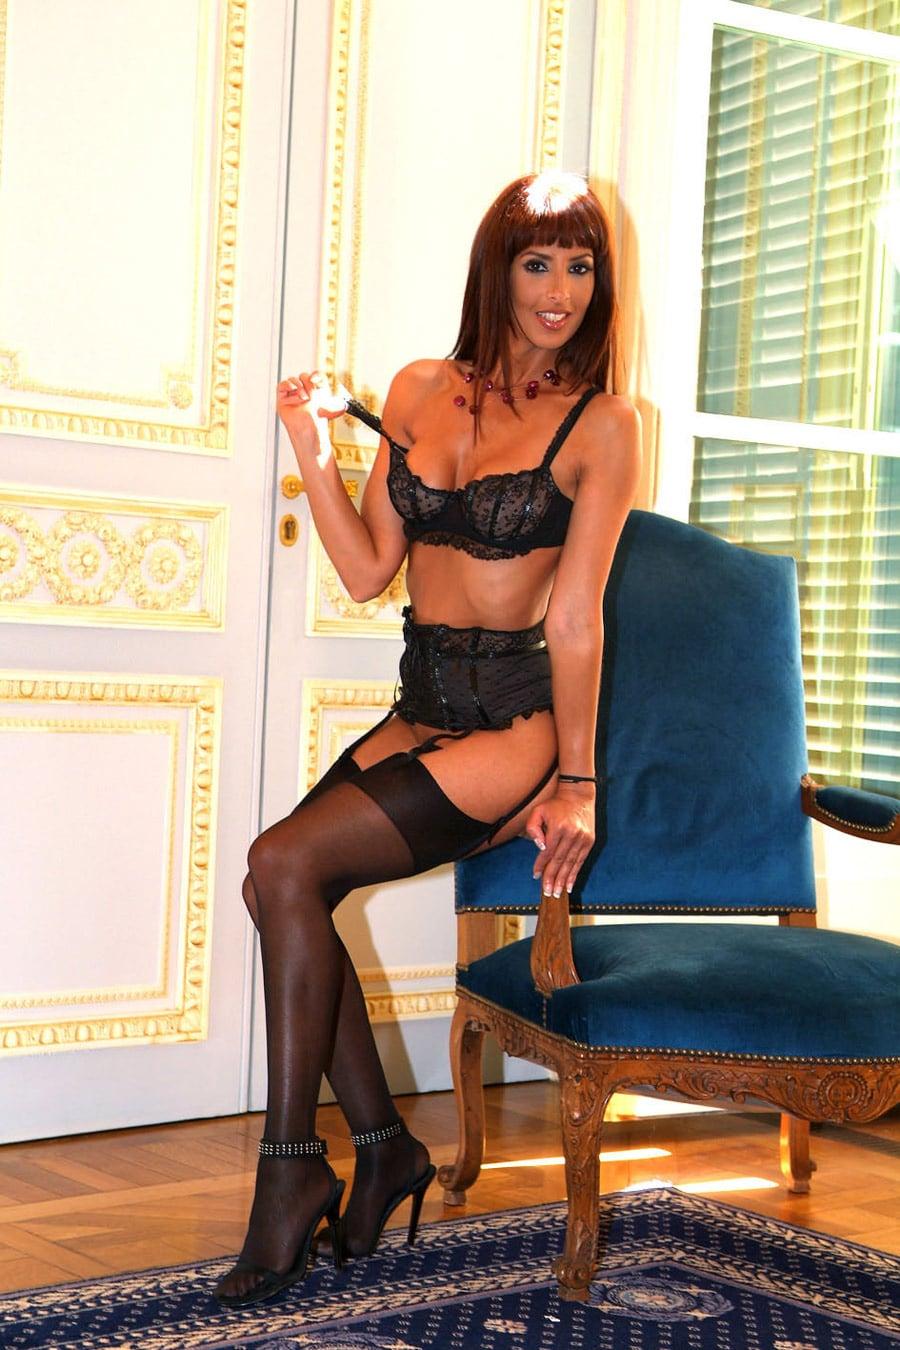 yasmine-bourgeoise-marocaine-sexy-porte-jarretelles-6